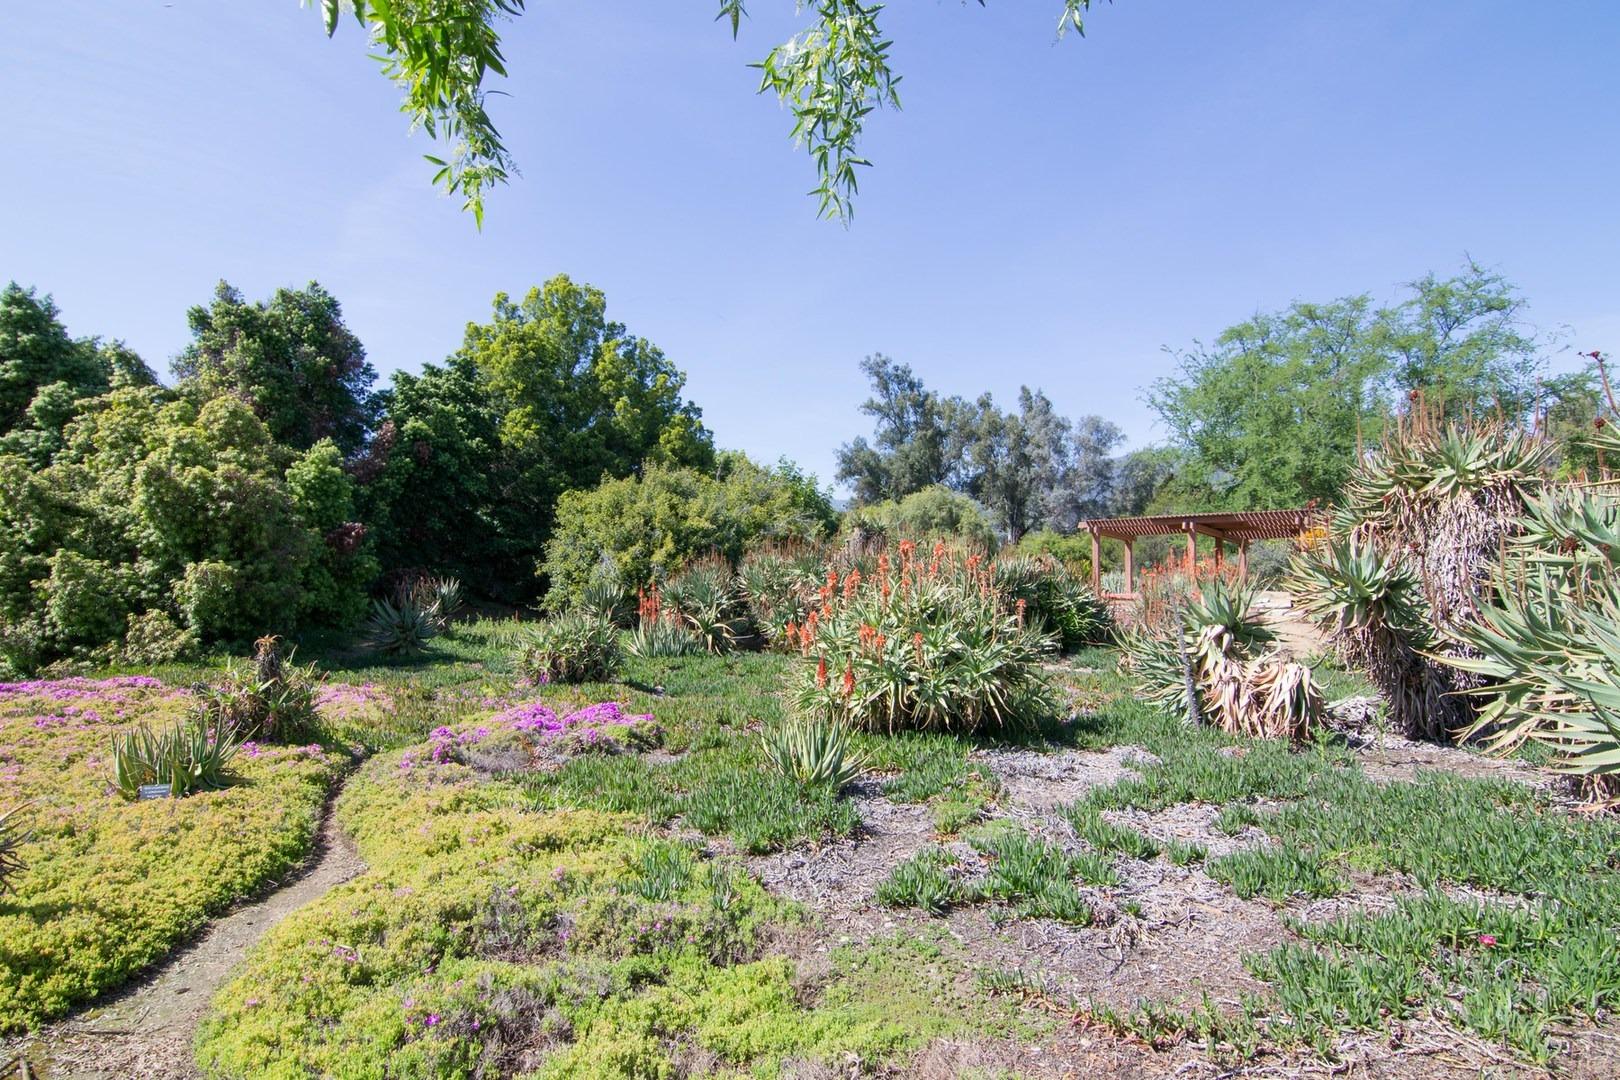 Los Angeles County Arboretum Botanic Garden Outdoor Project